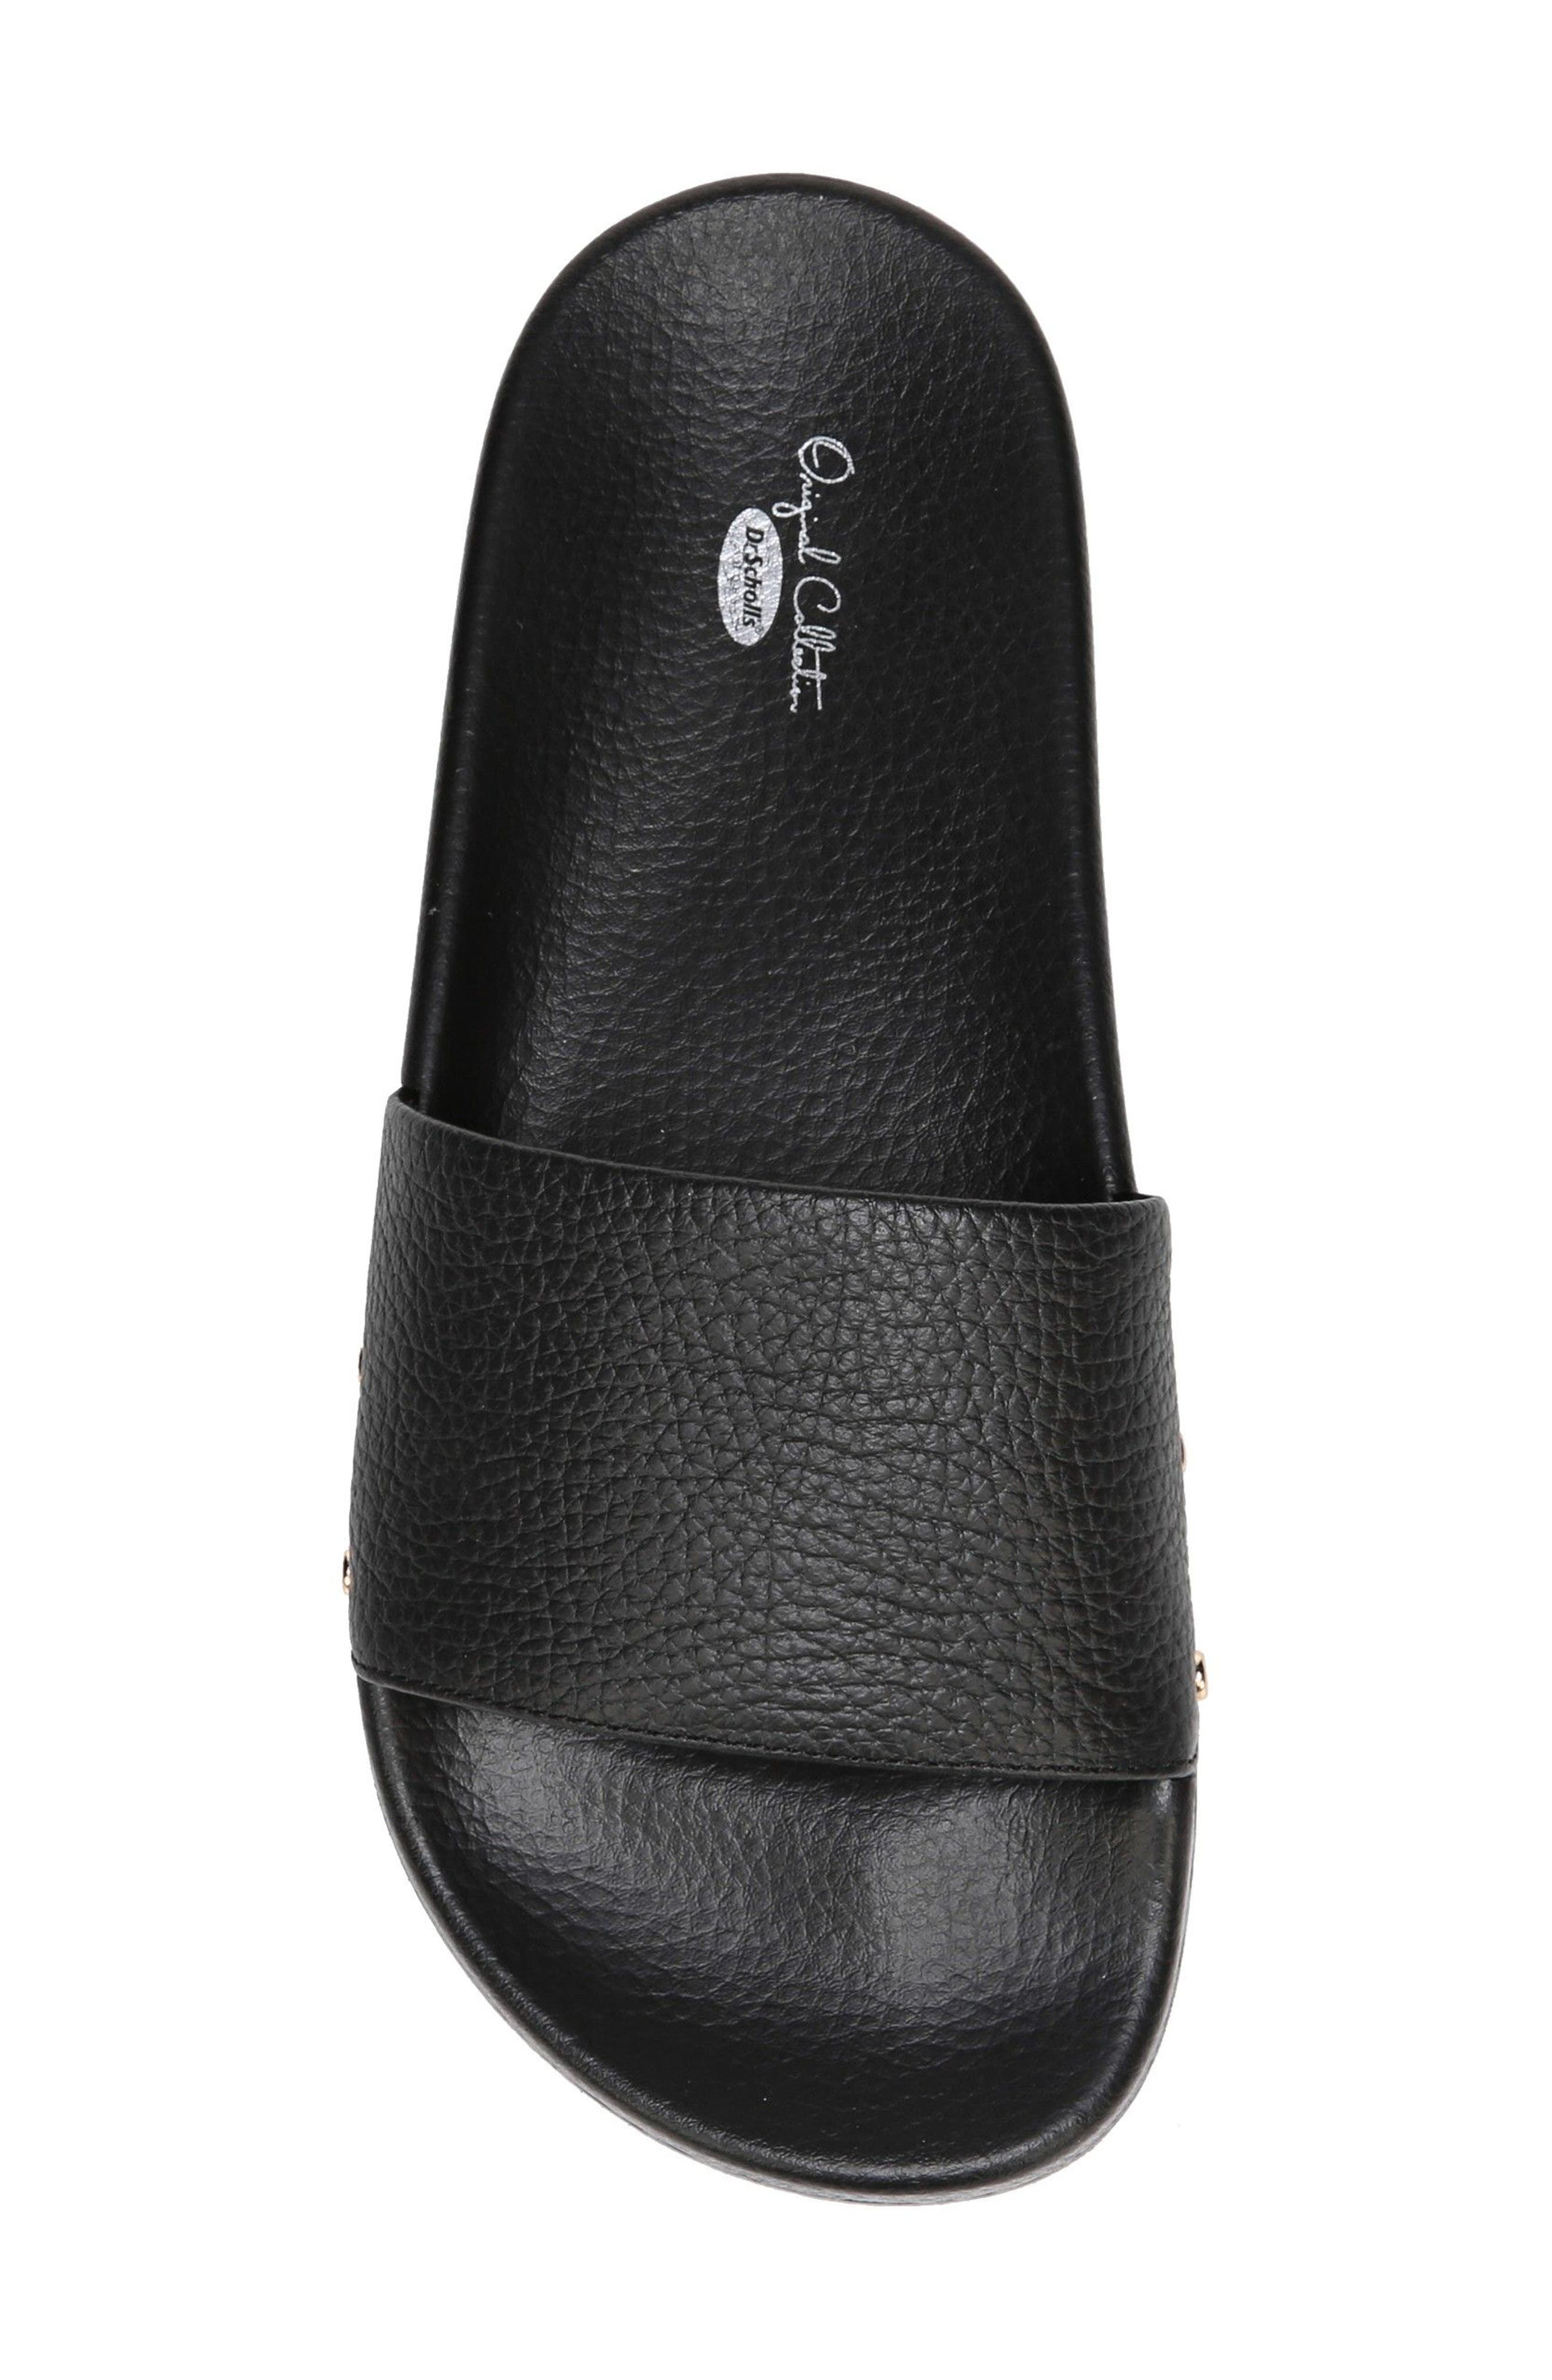 Pisces Slide Sandal,                             Alternate thumbnail 5, color,                             Black Leather